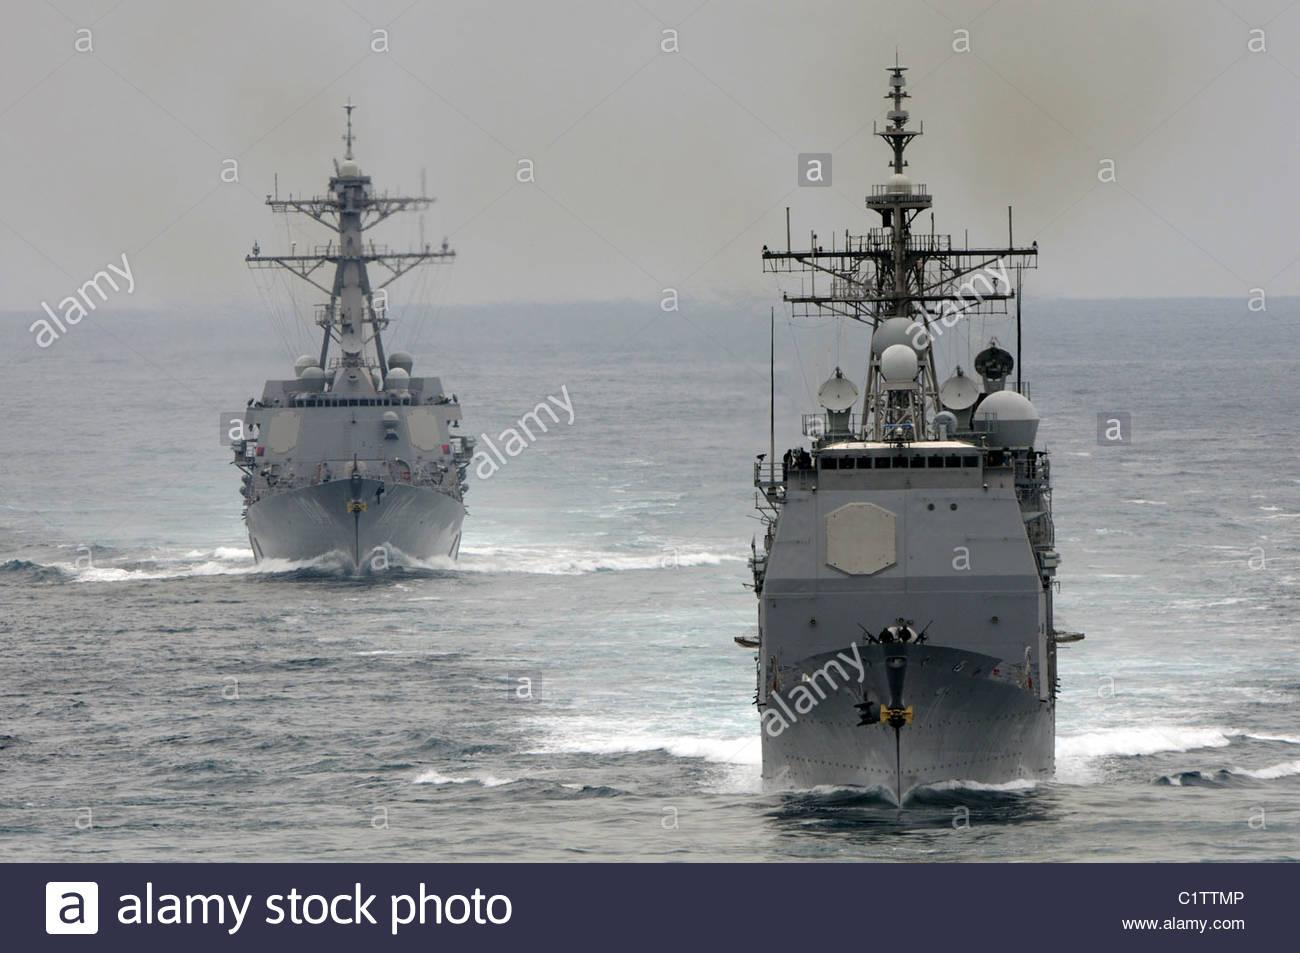 USS Cape St. George - Stock Image